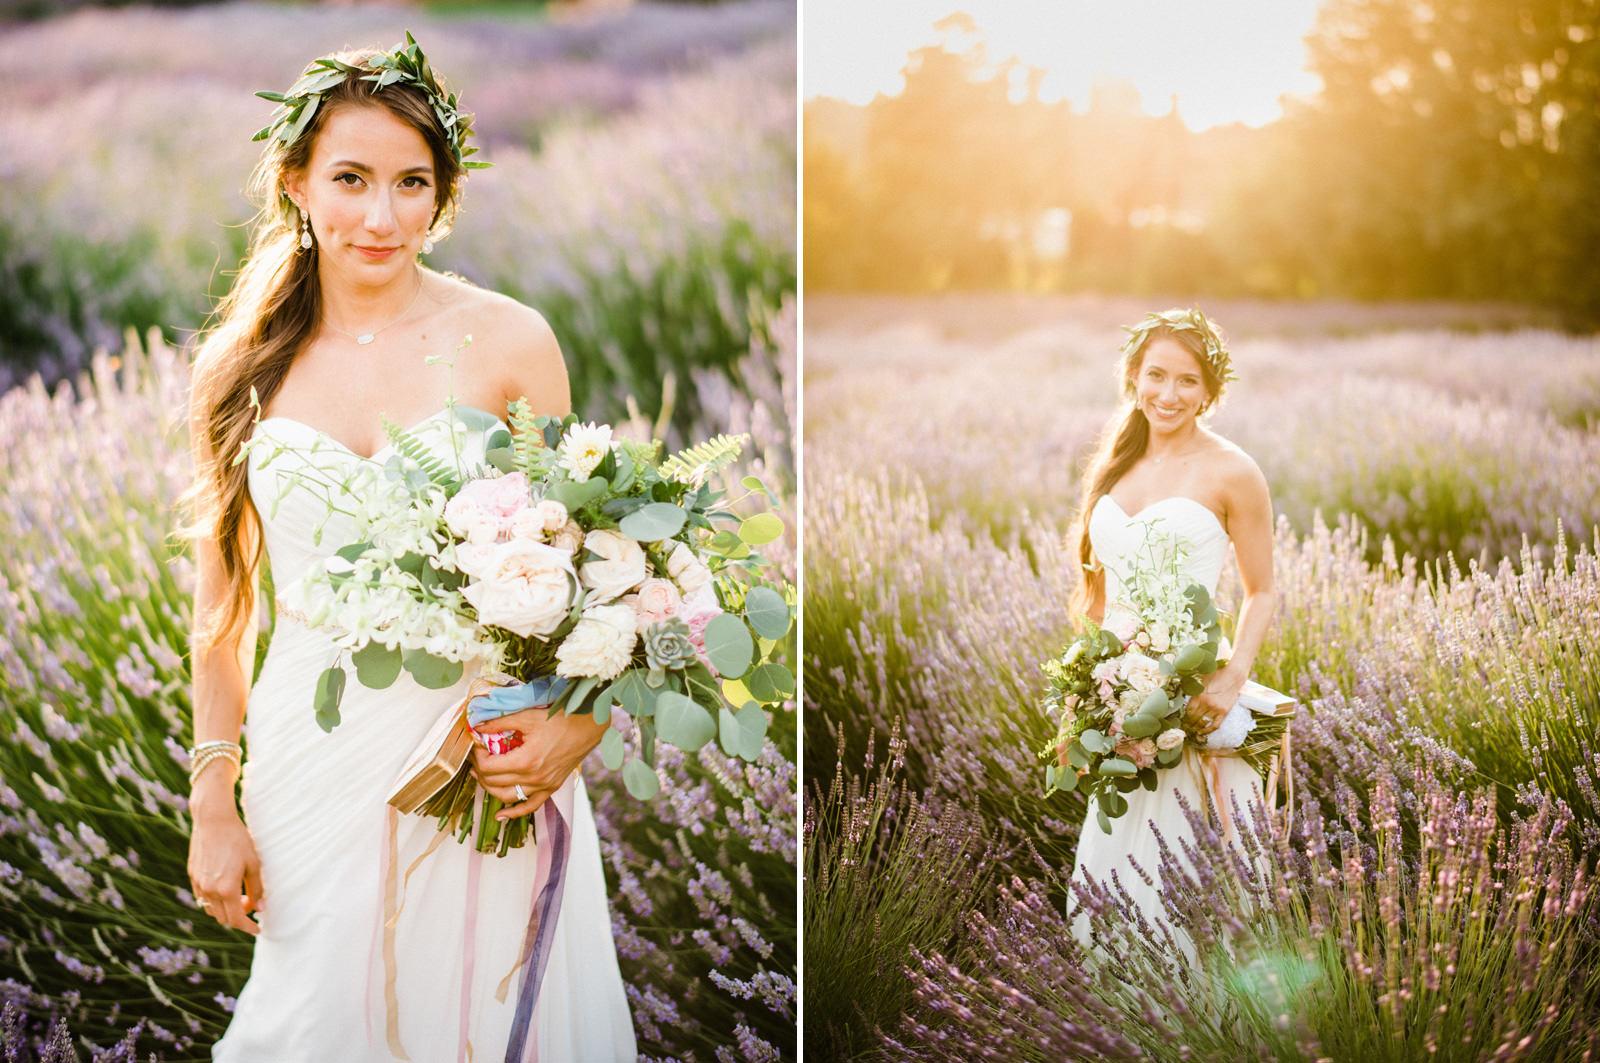 095-woodinville-lavendar-farm-wedding-with-golden-glowy-photos.jpg